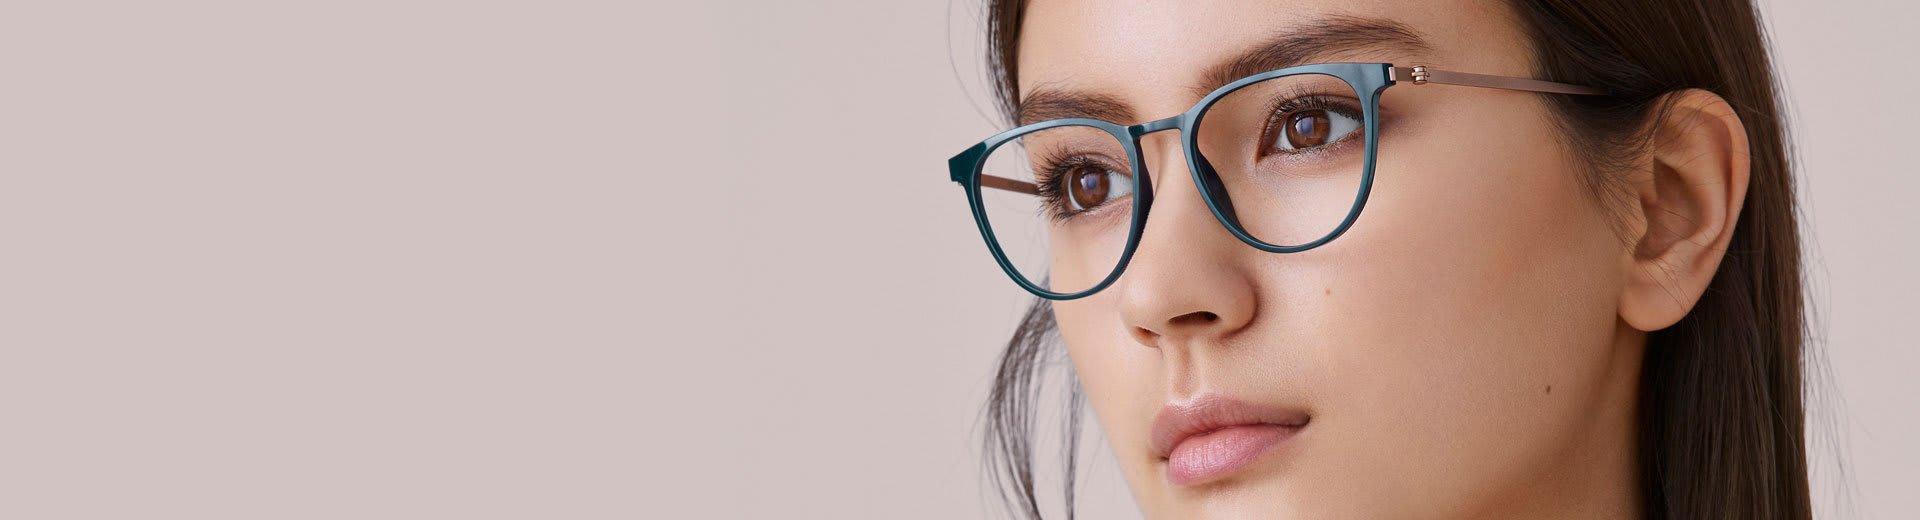 eye-collection-2019-min